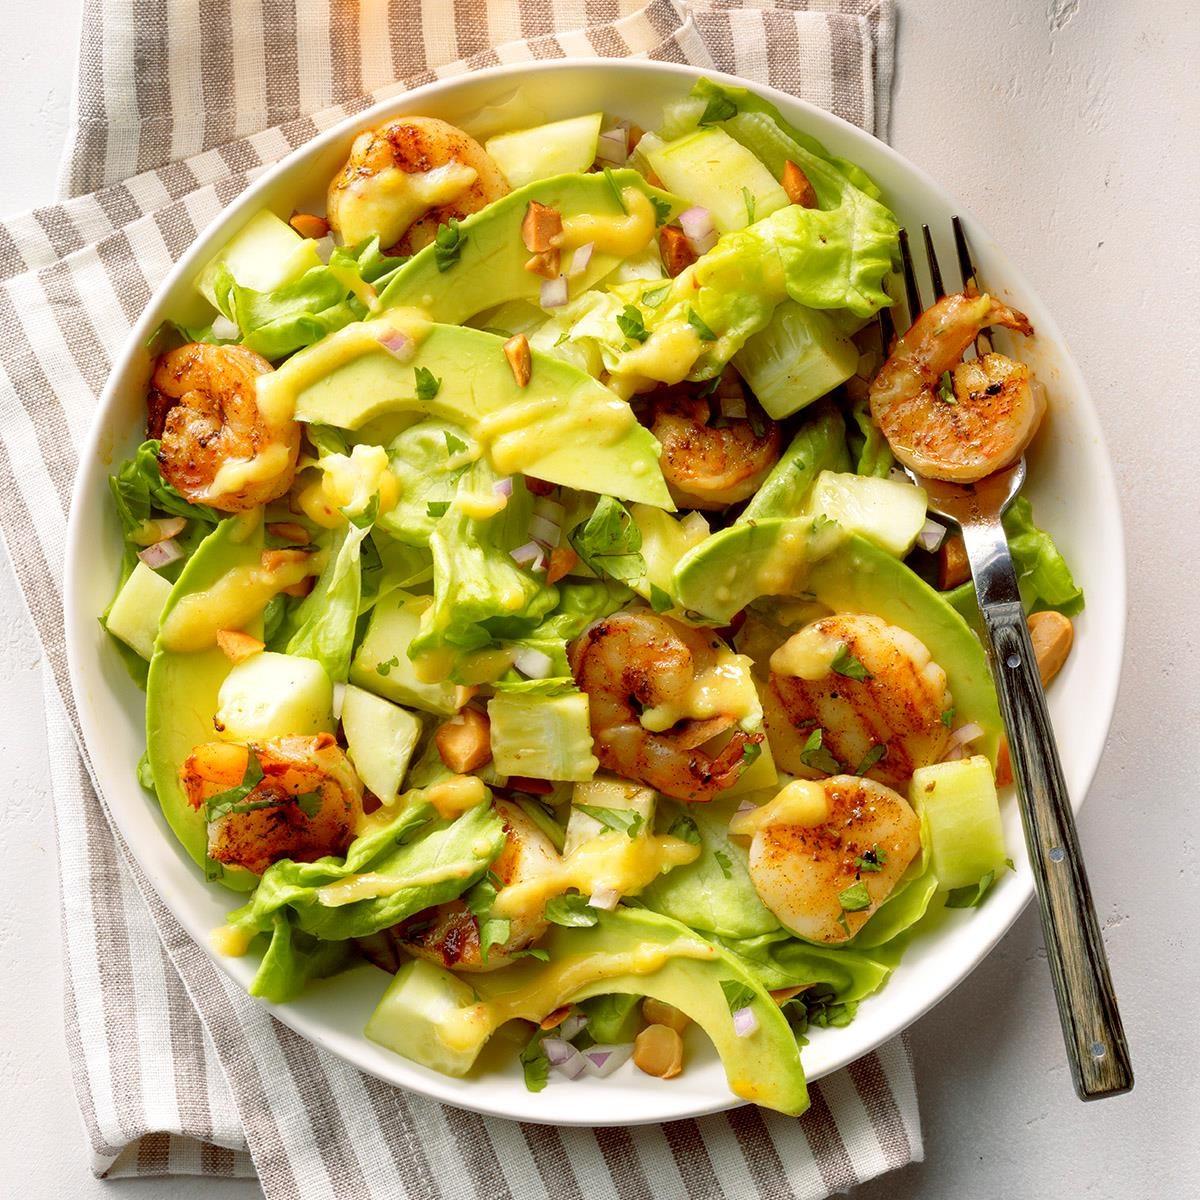 Shrimp 'n' Scallops Tropical Salad